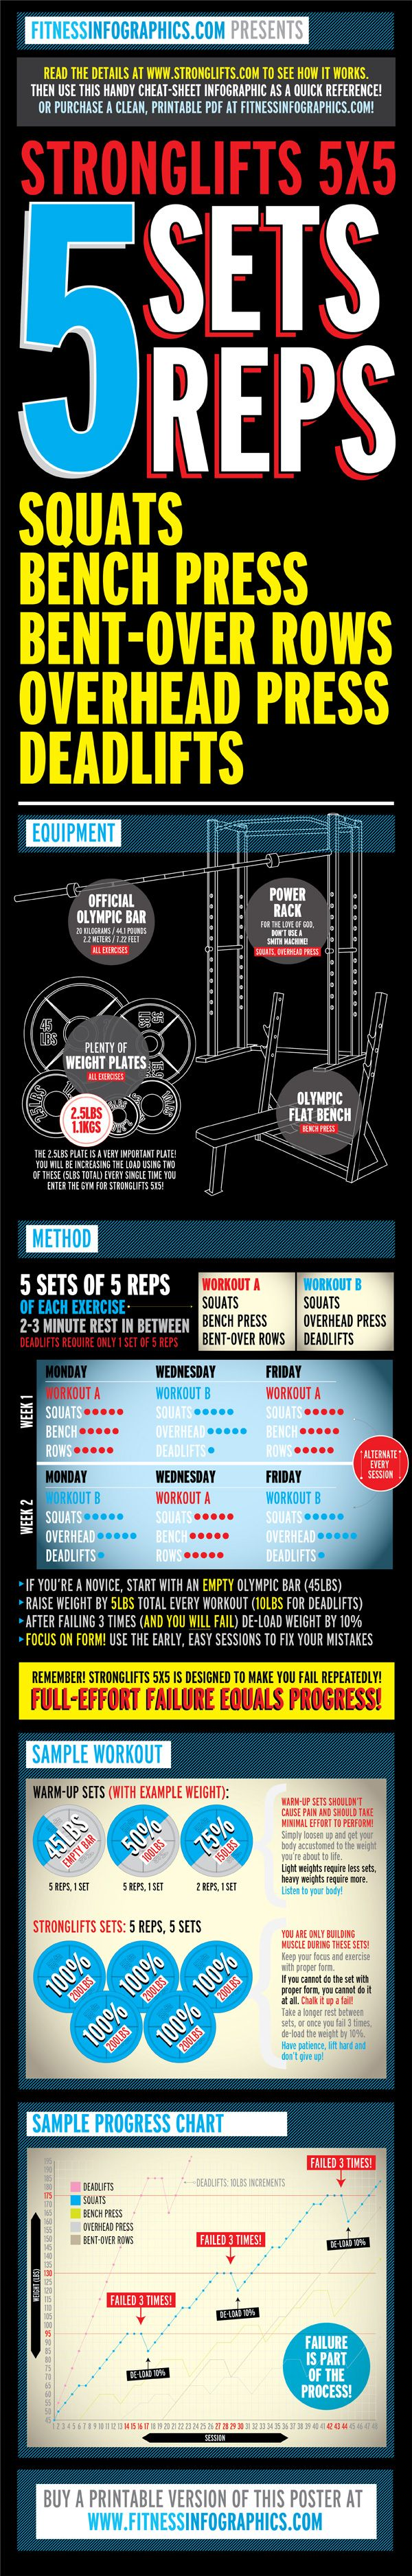 Stronglifts 5X5 program | Health & Fitness | Pinterest